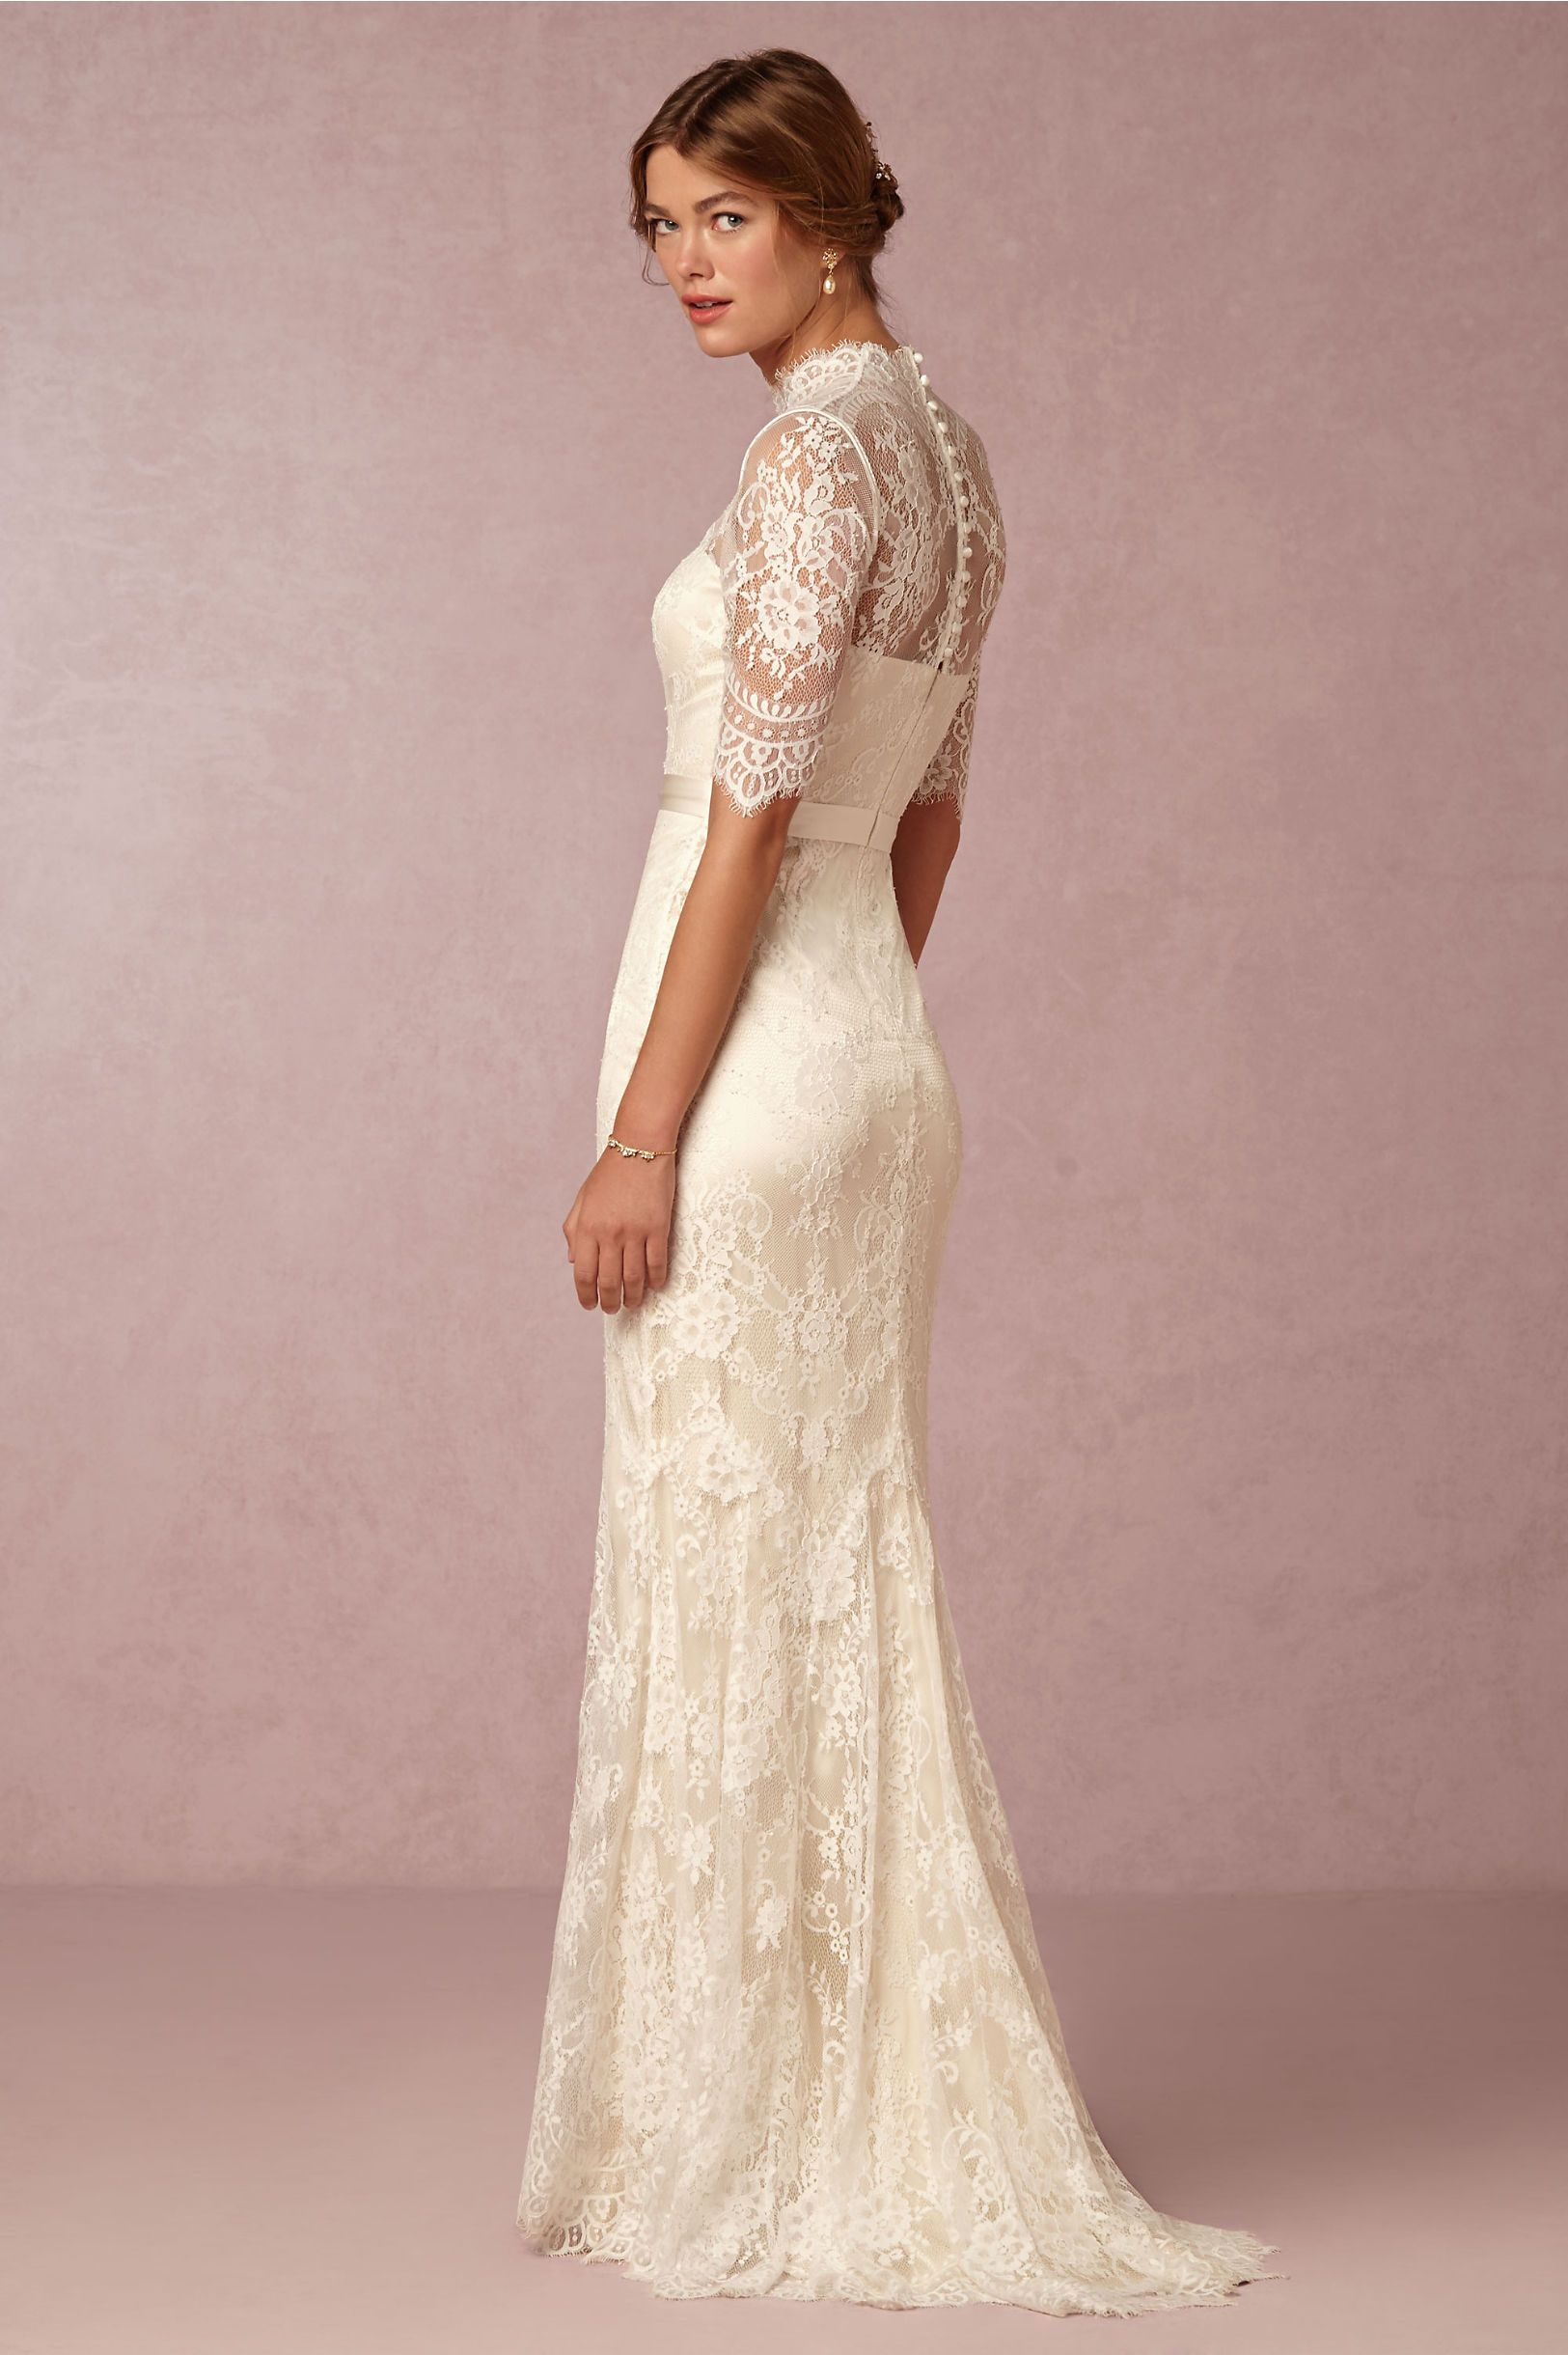 Bridgette STUNNING Cream Lace Column Sheath Wedding Gown Showcasing Half Illusion